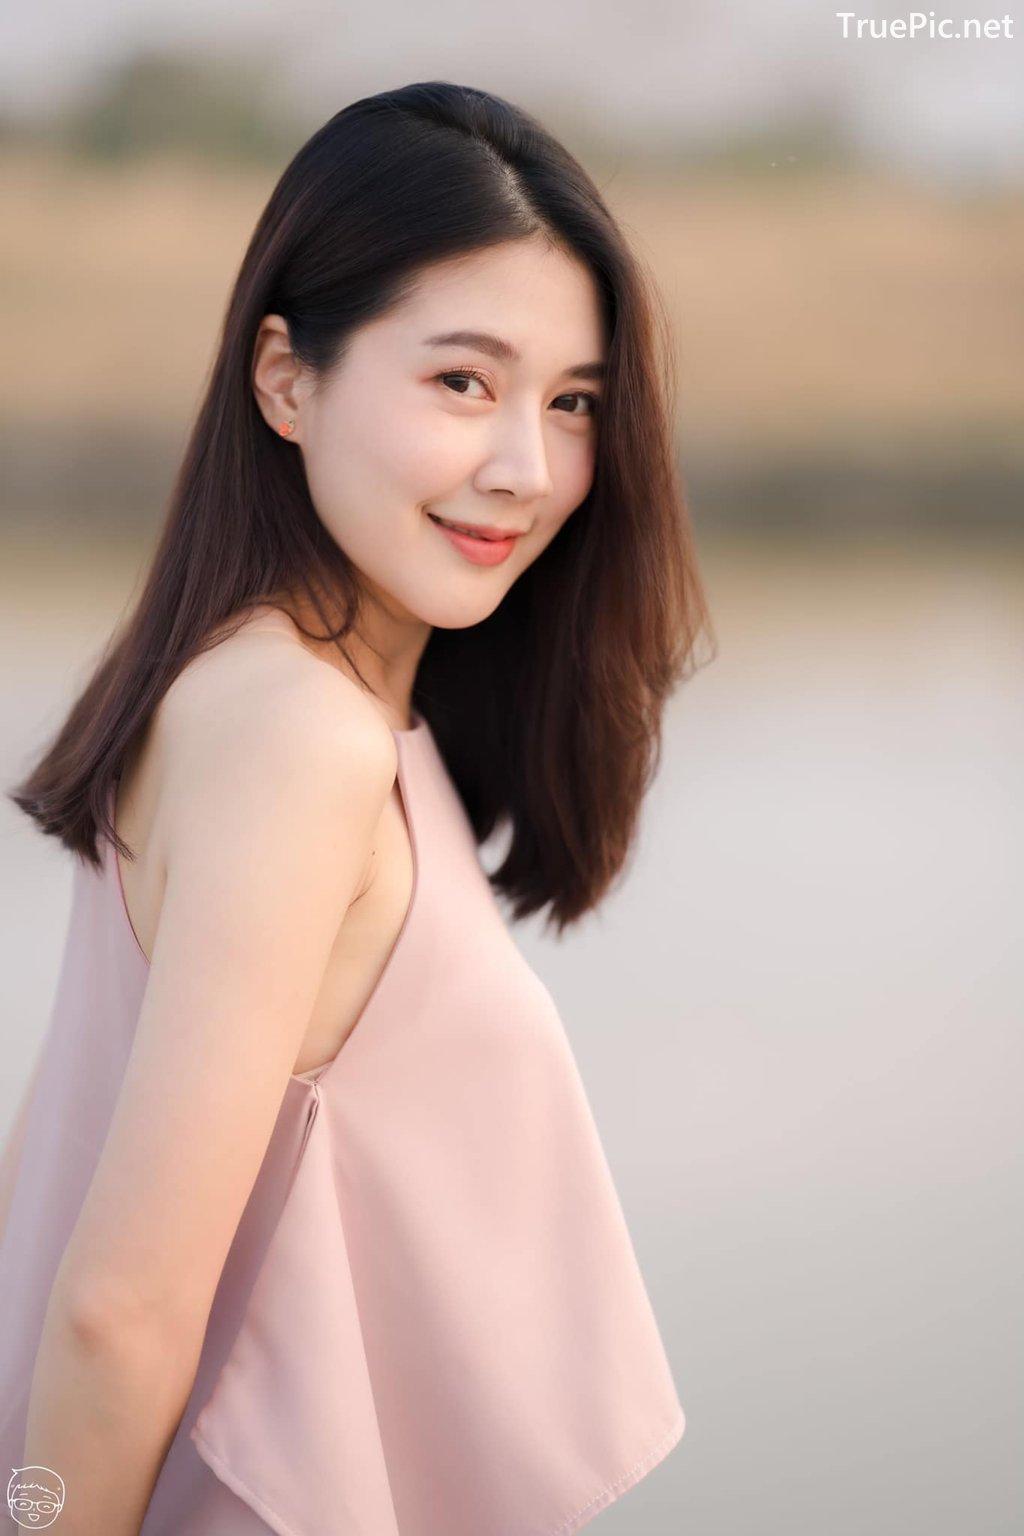 Image Thailand Model - Namlom Homhuan - Sweet Pink - TruePic.net - Picture-4